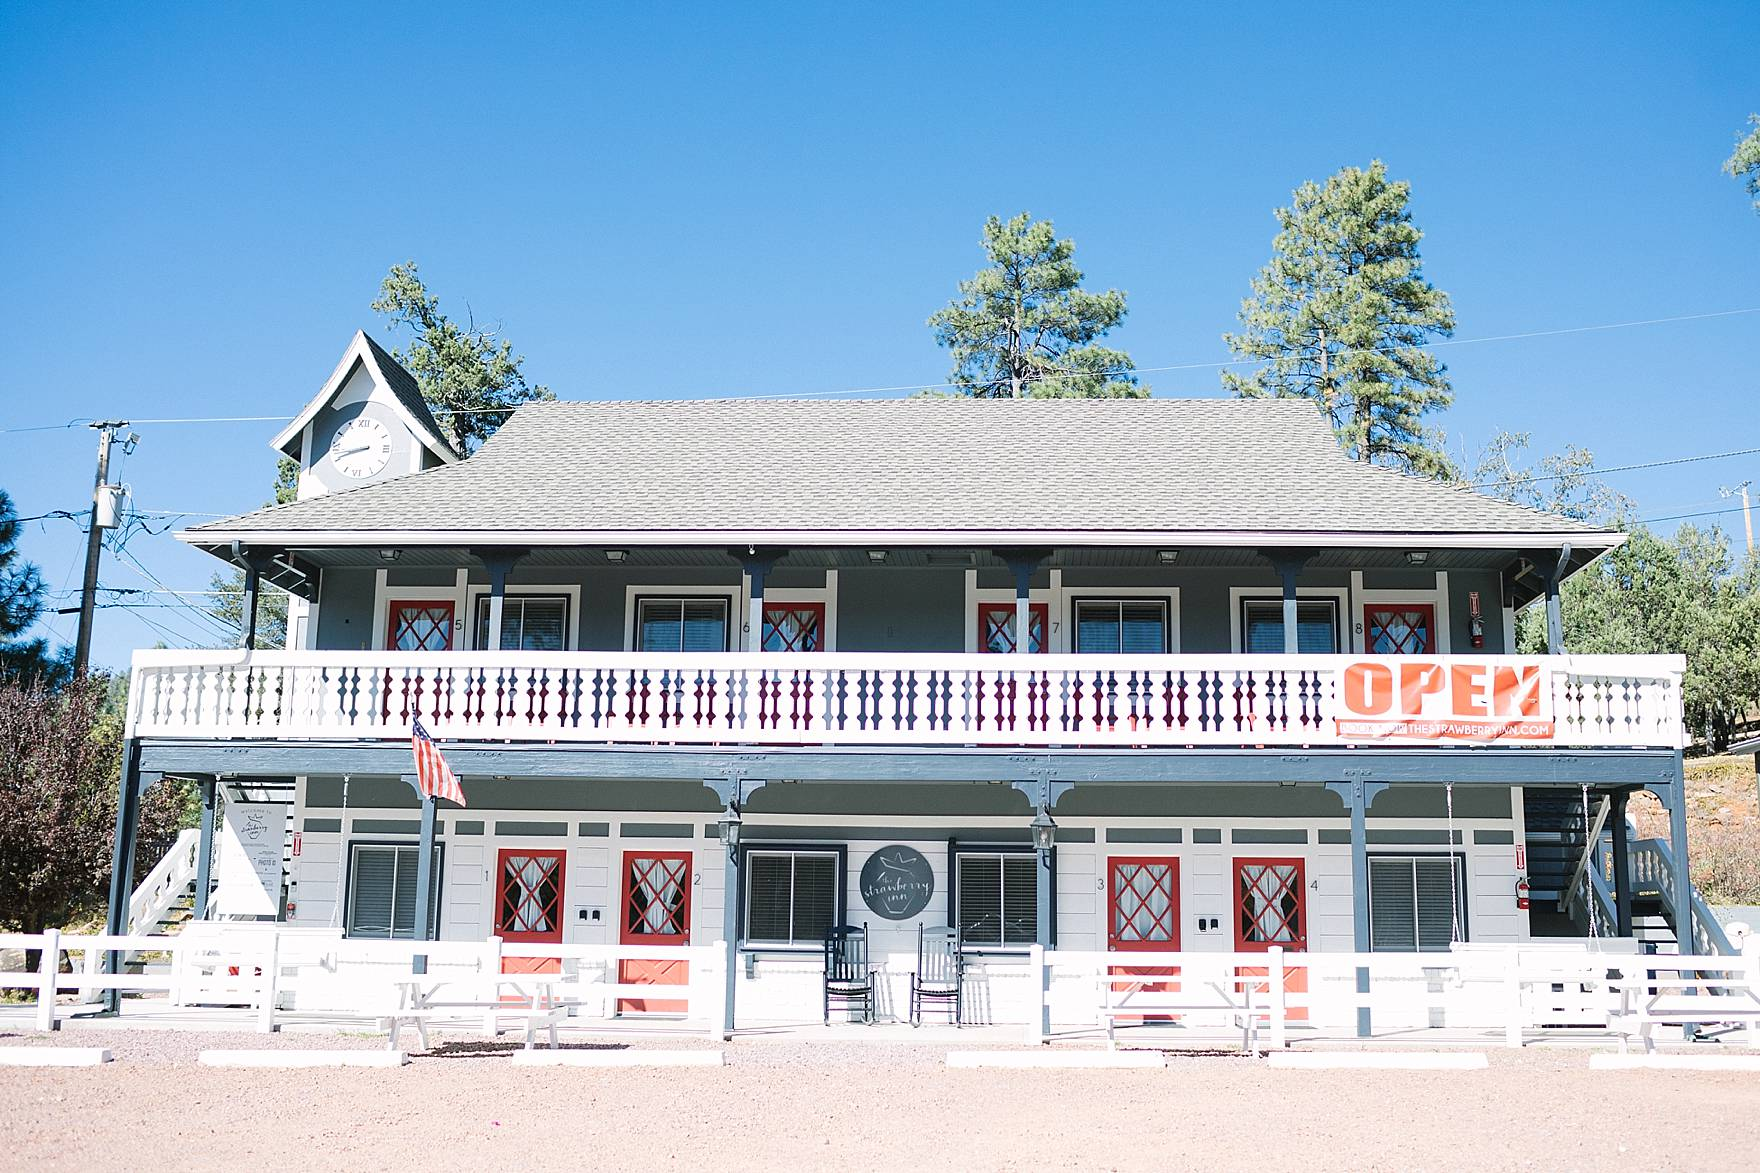 The Strawberry Inn - Strawberry Arizona cute little boutique hotel